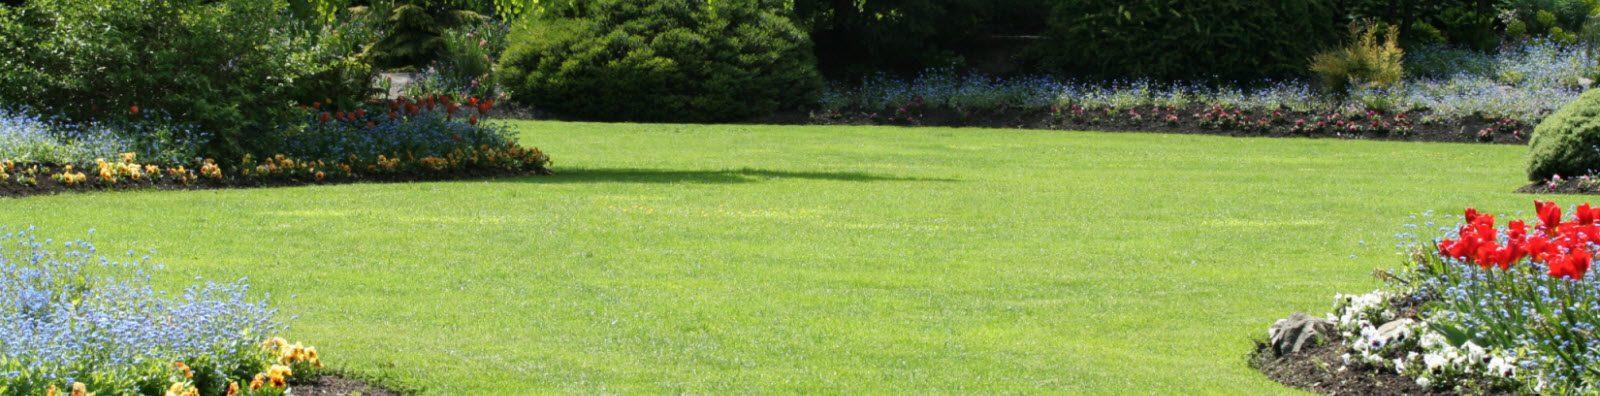 Organic Lawn Care